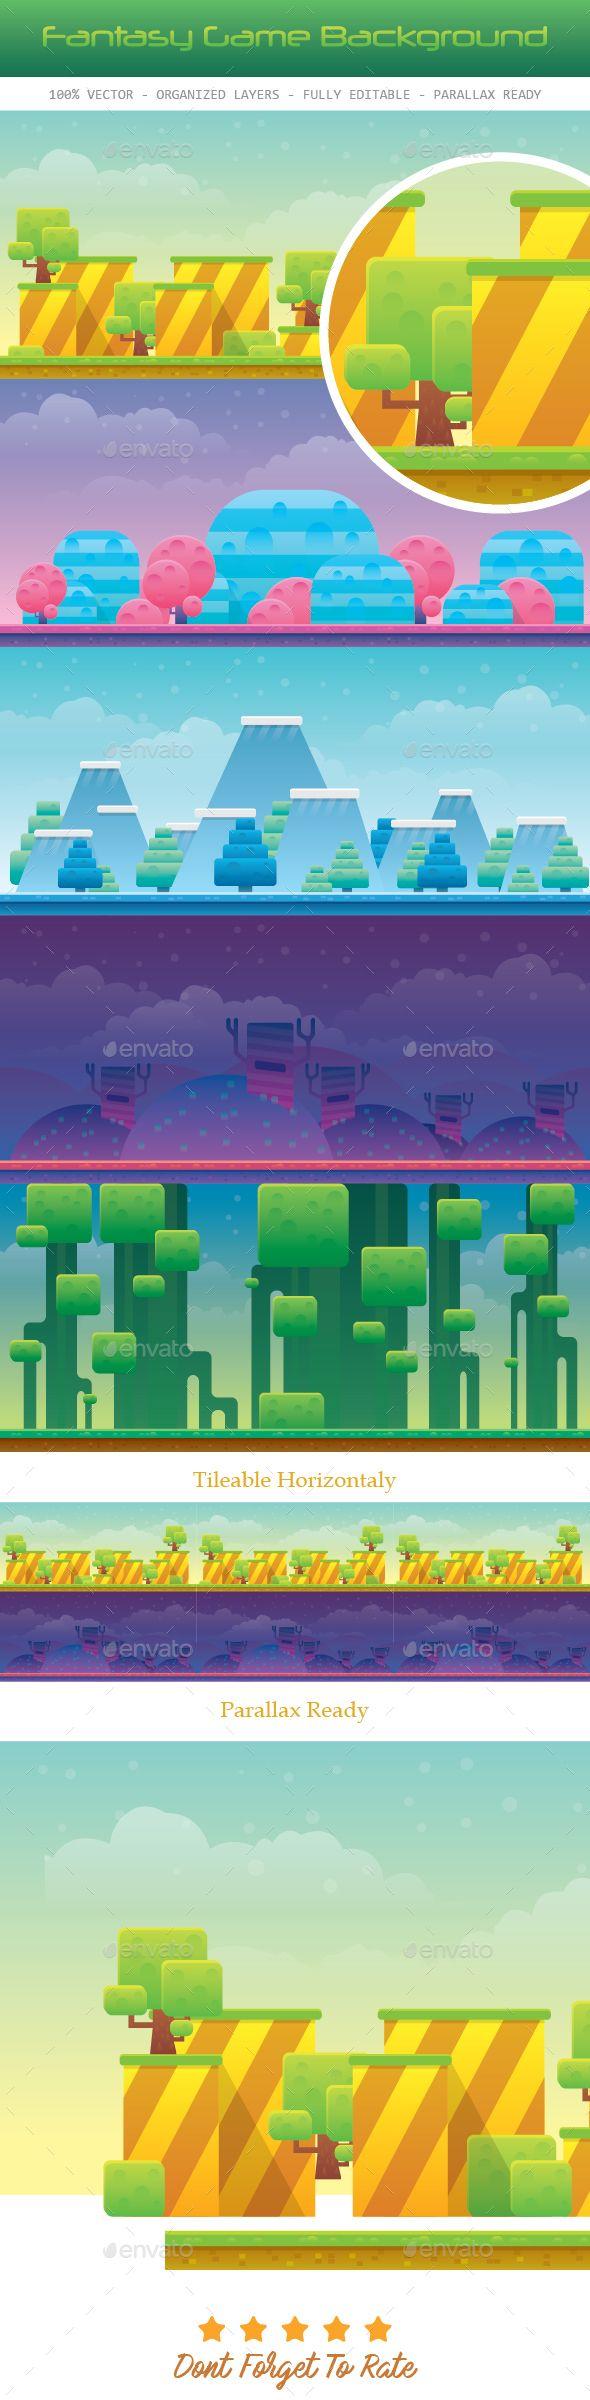 5 Fantasy Game Background